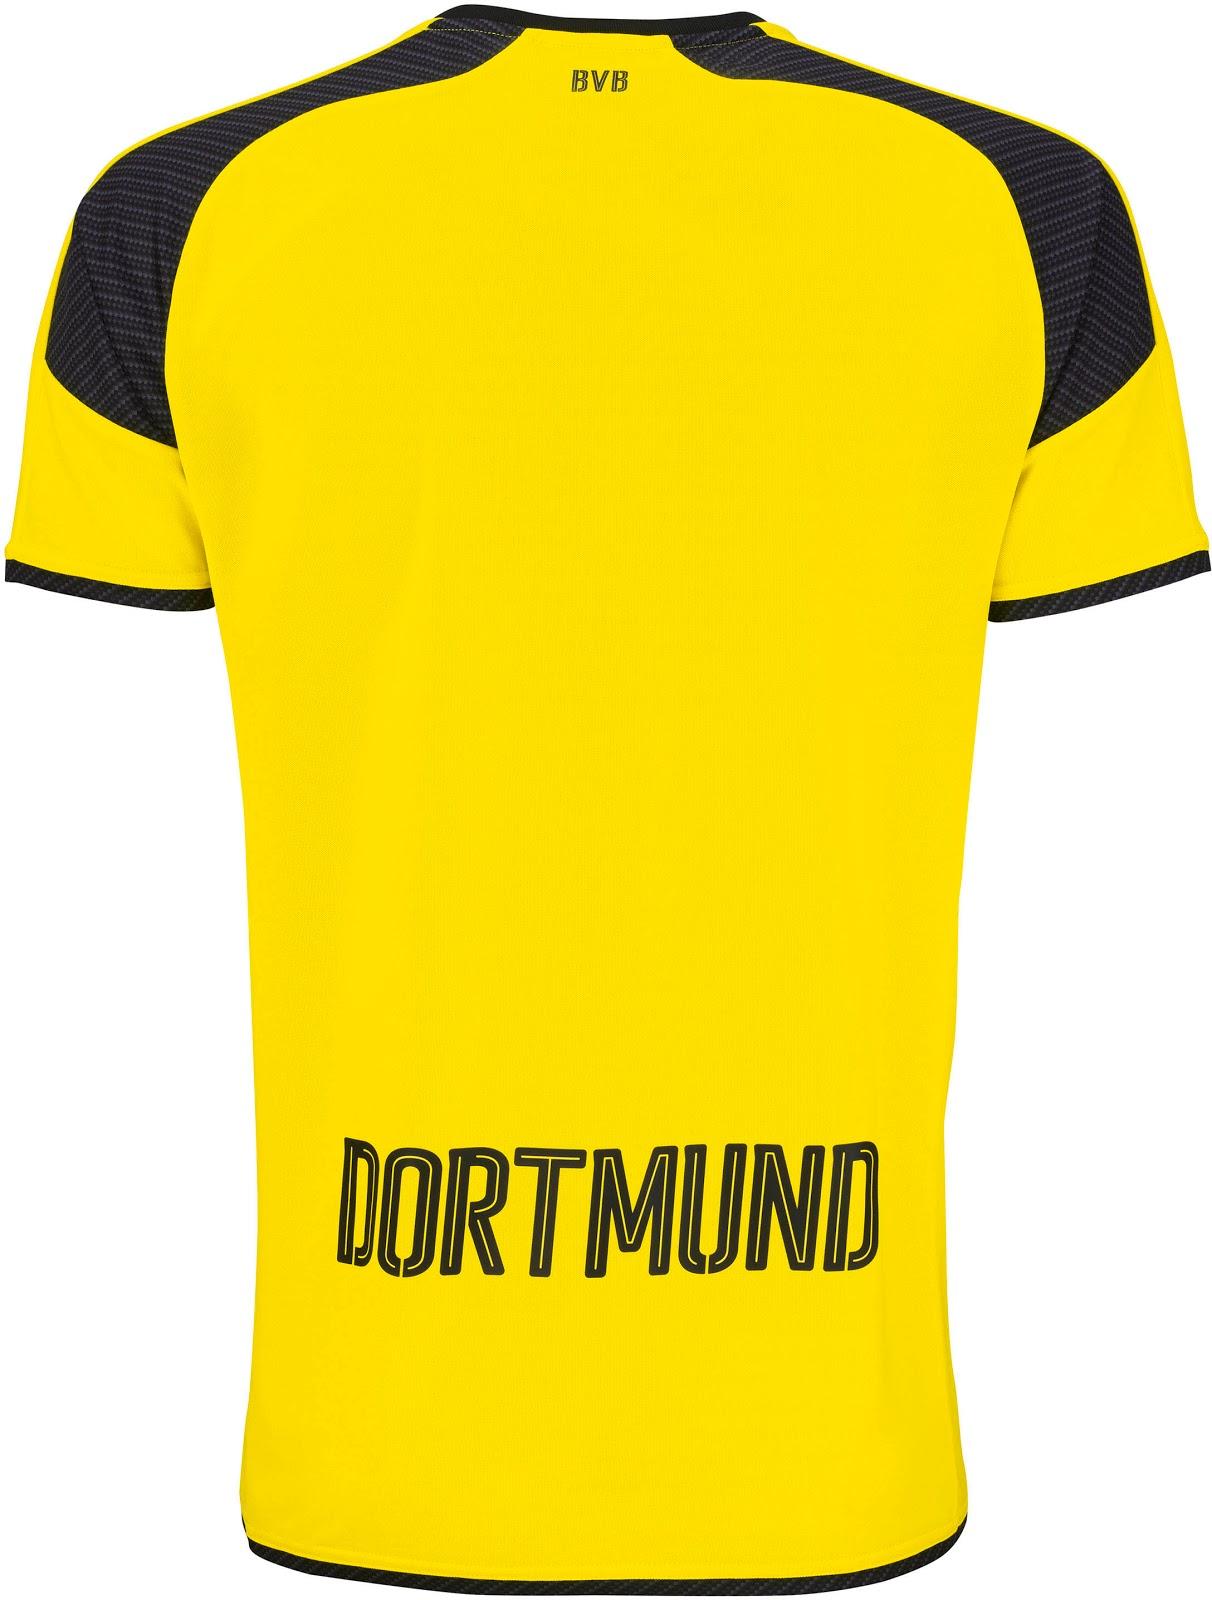 champions dortmund